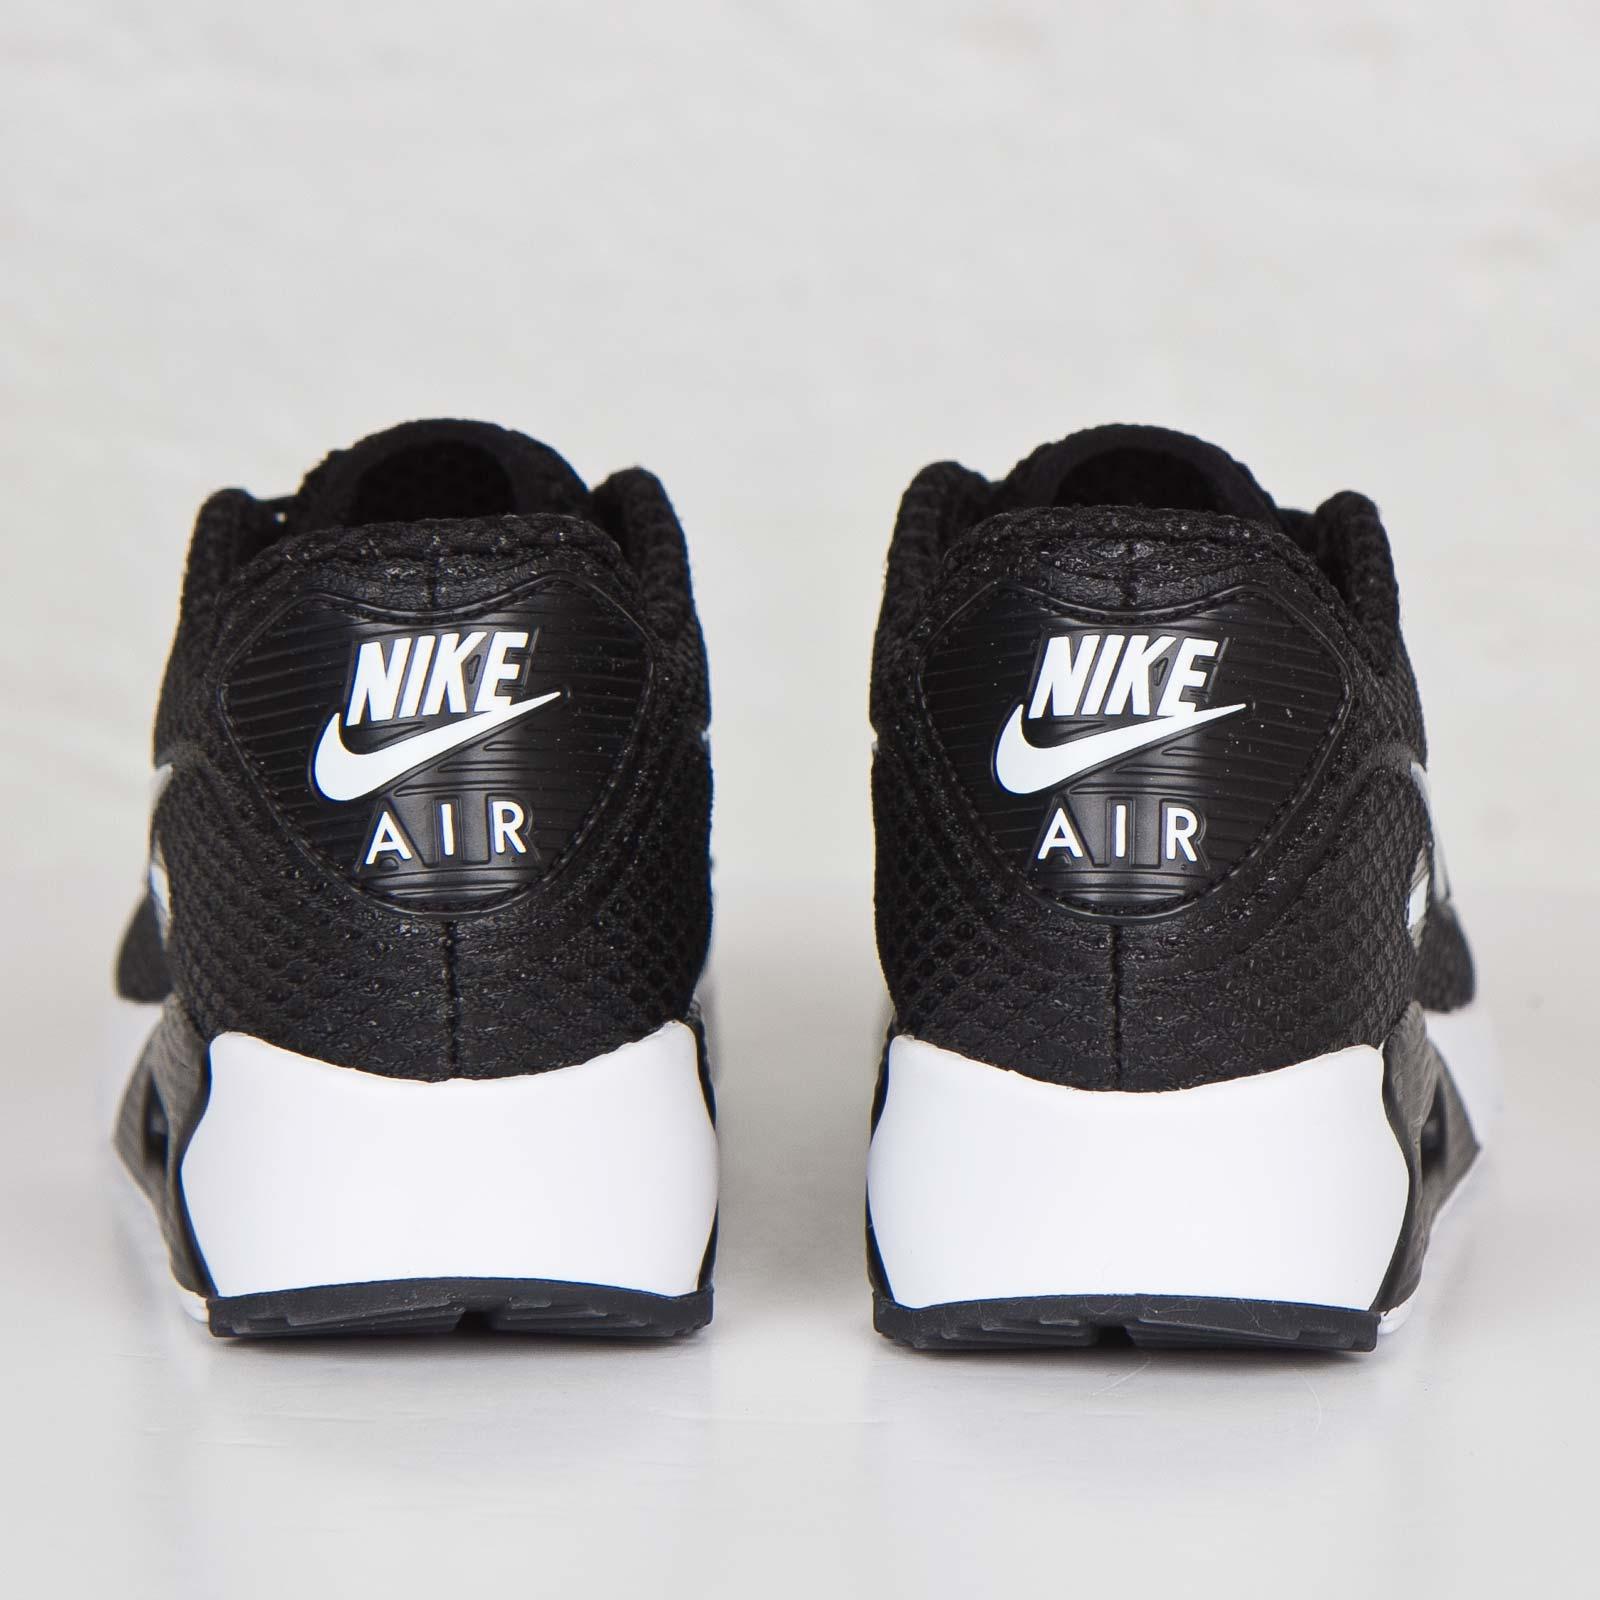 innovative design 32780 627dc Nike Air Max 90 Ultra Br Plus QS - 810170-002 - Sneakersnstuff   sneakers    streetwear online since 1999